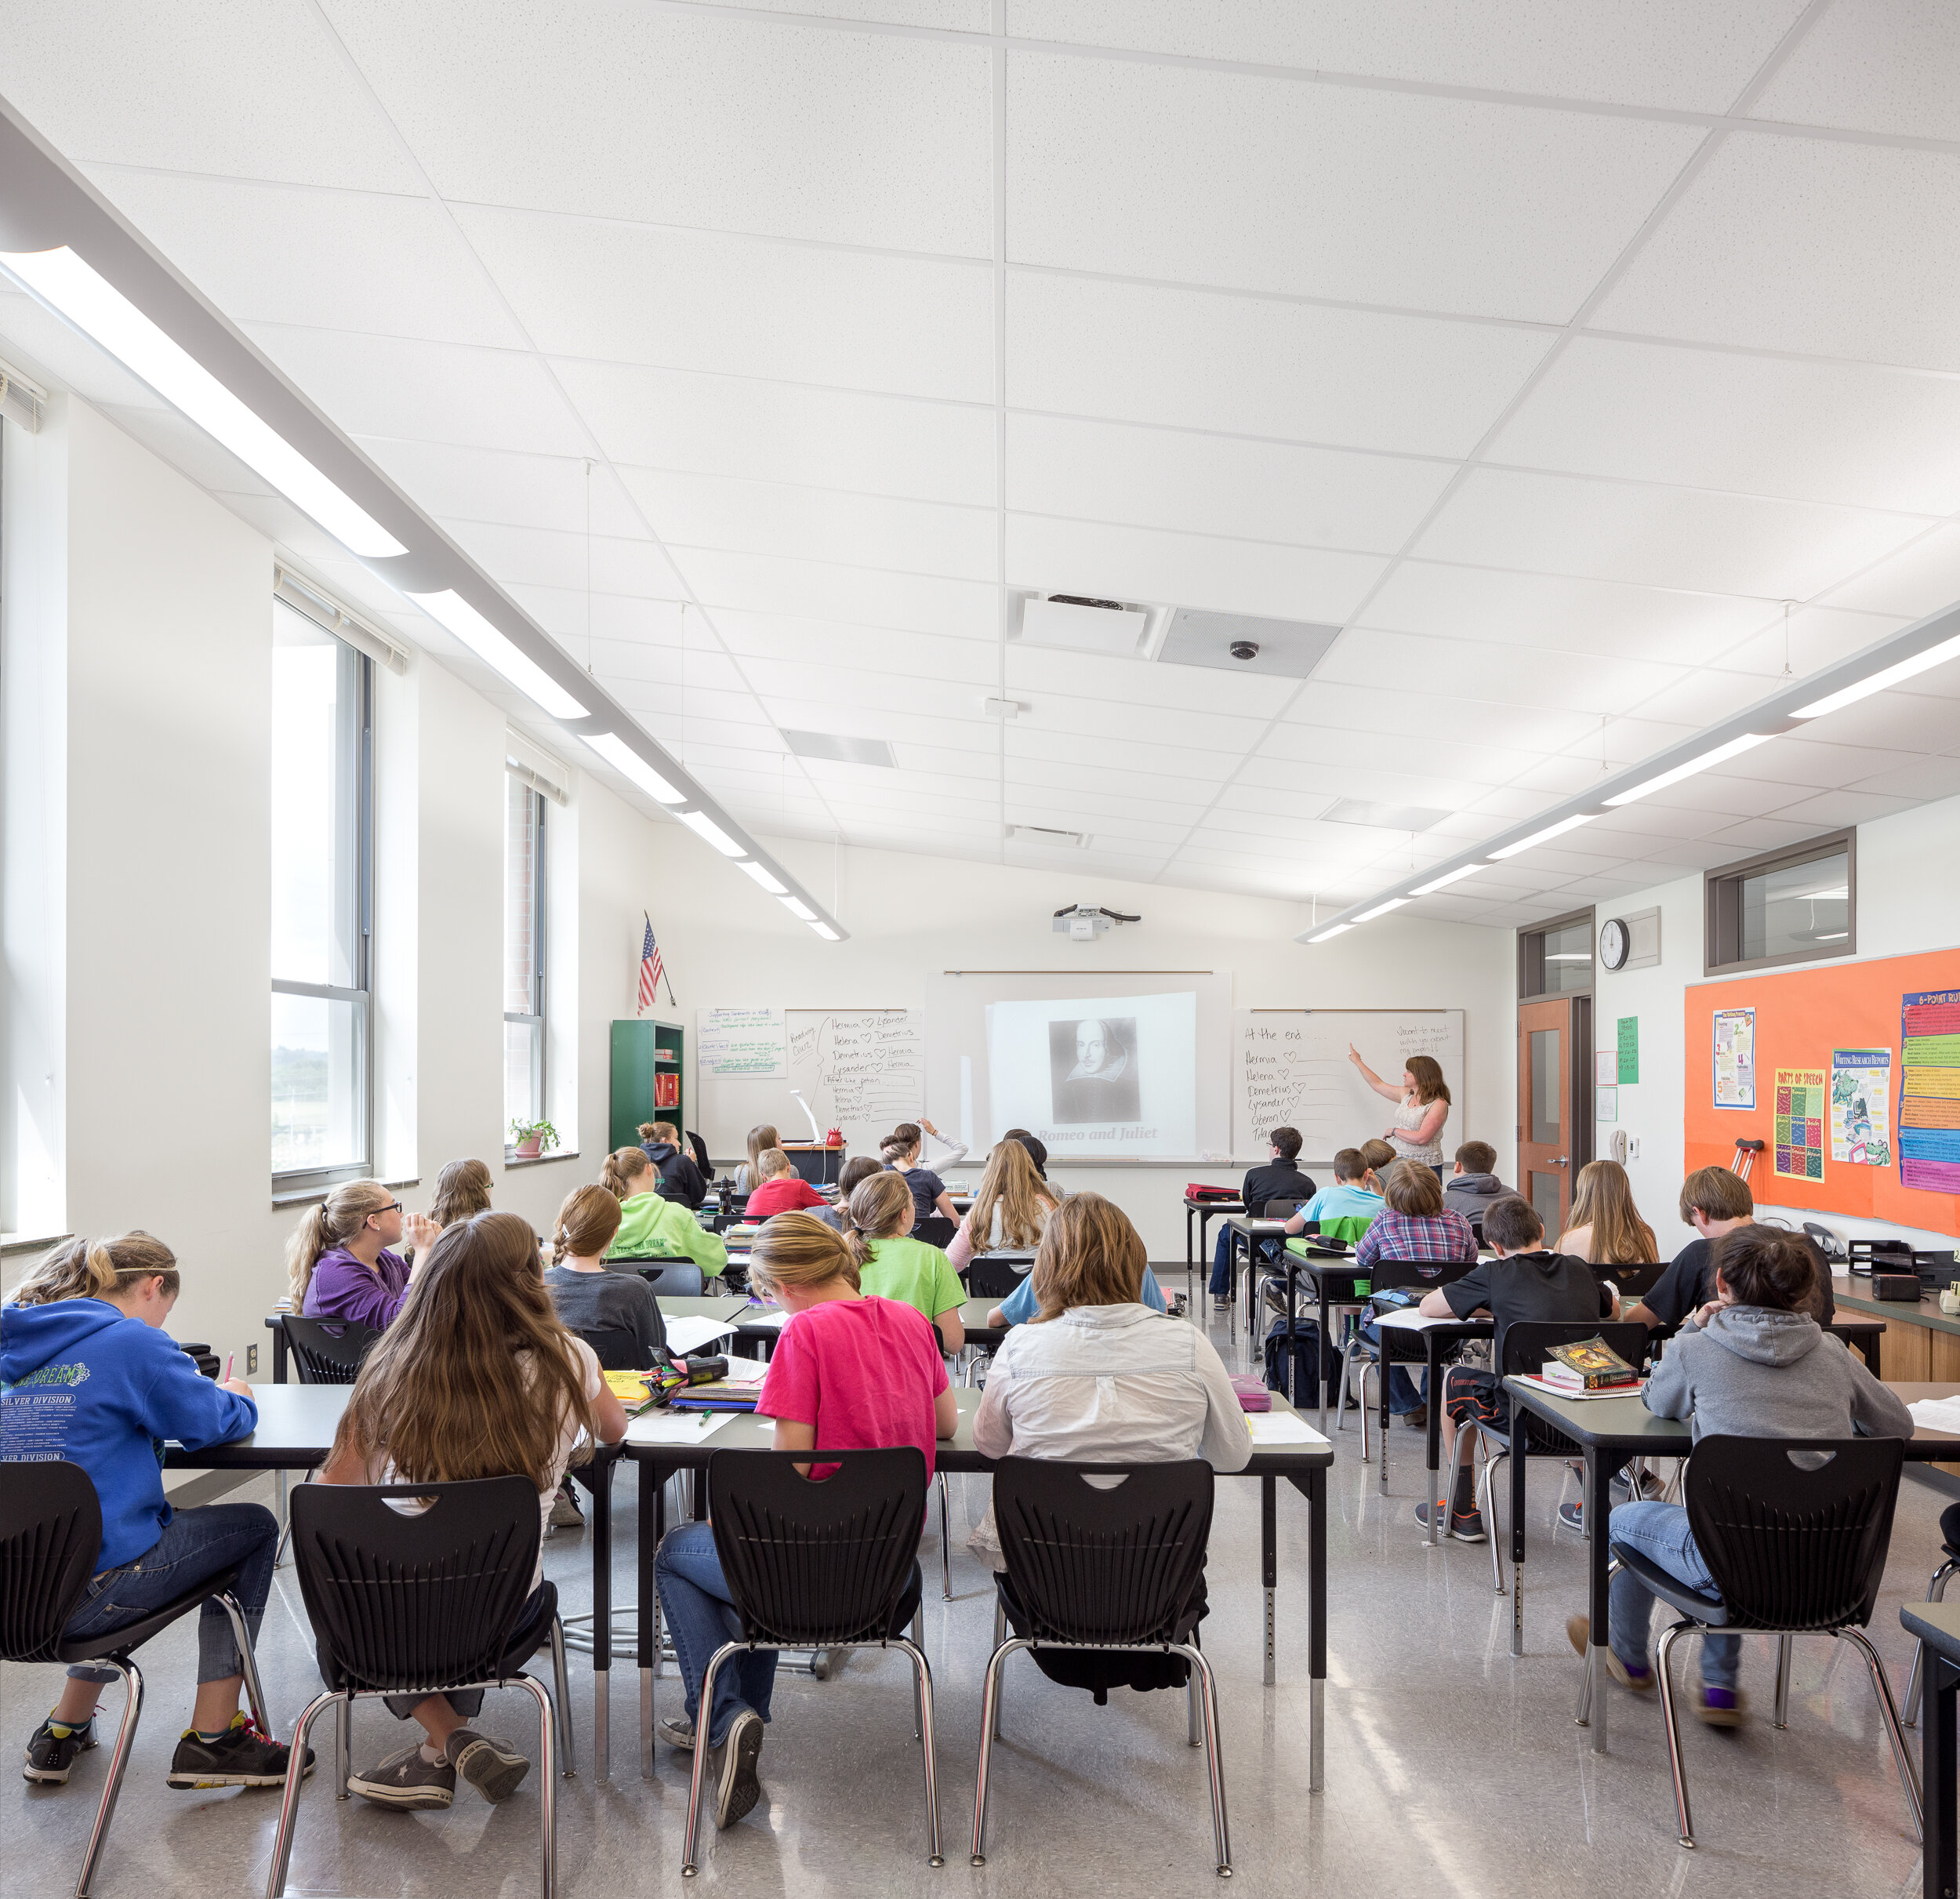 78-BanksMS-JoshPartee-0923-classroom.jpg